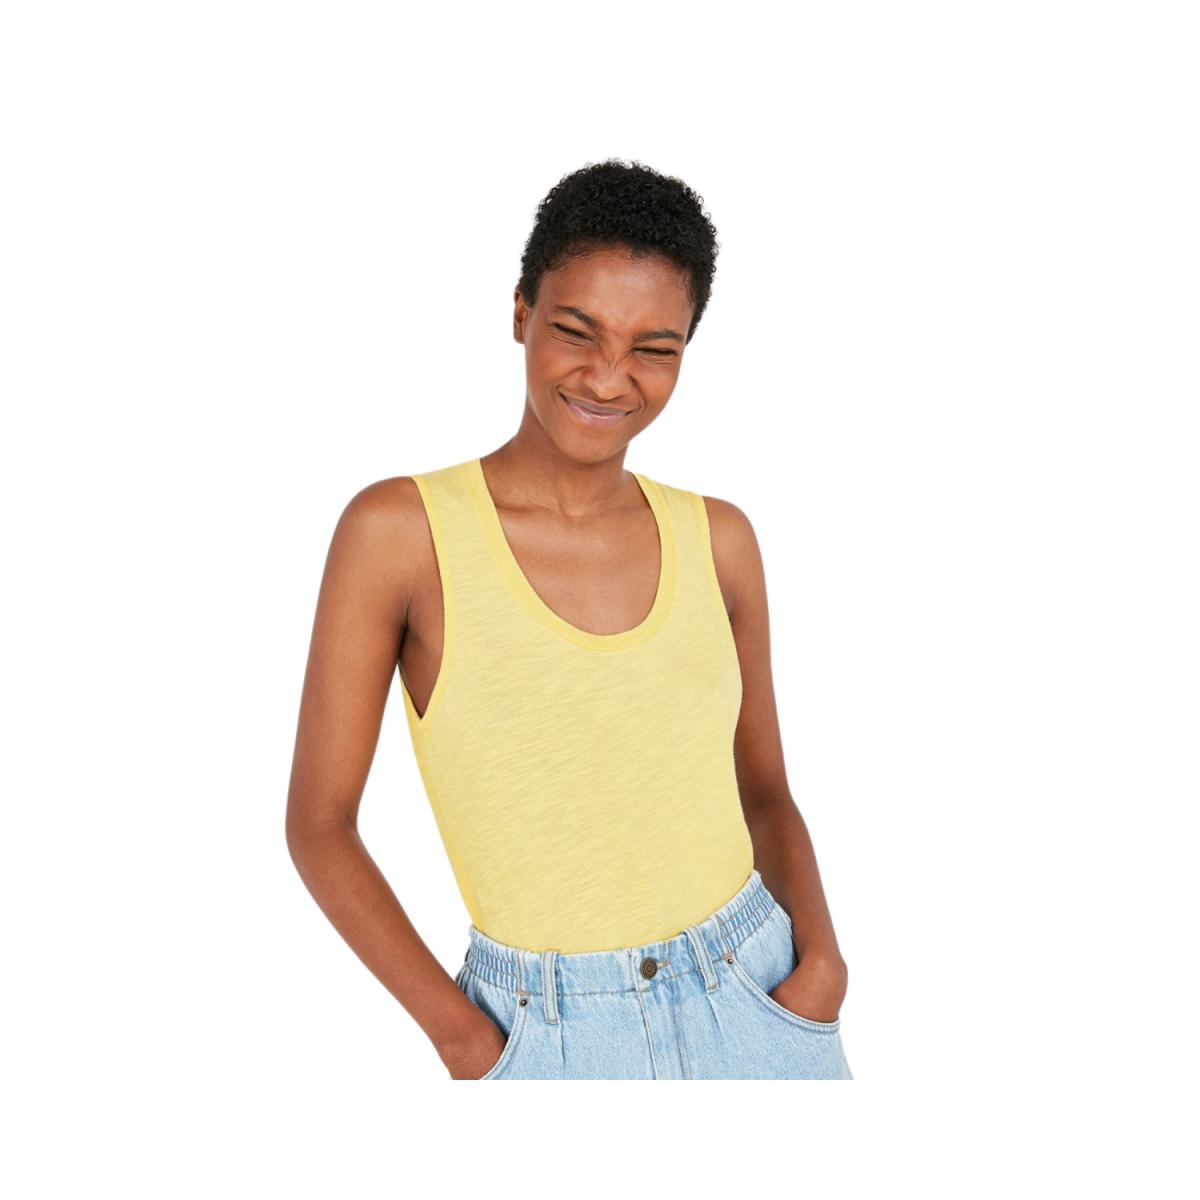 jacksonville strop - genet t-shirt - model billede